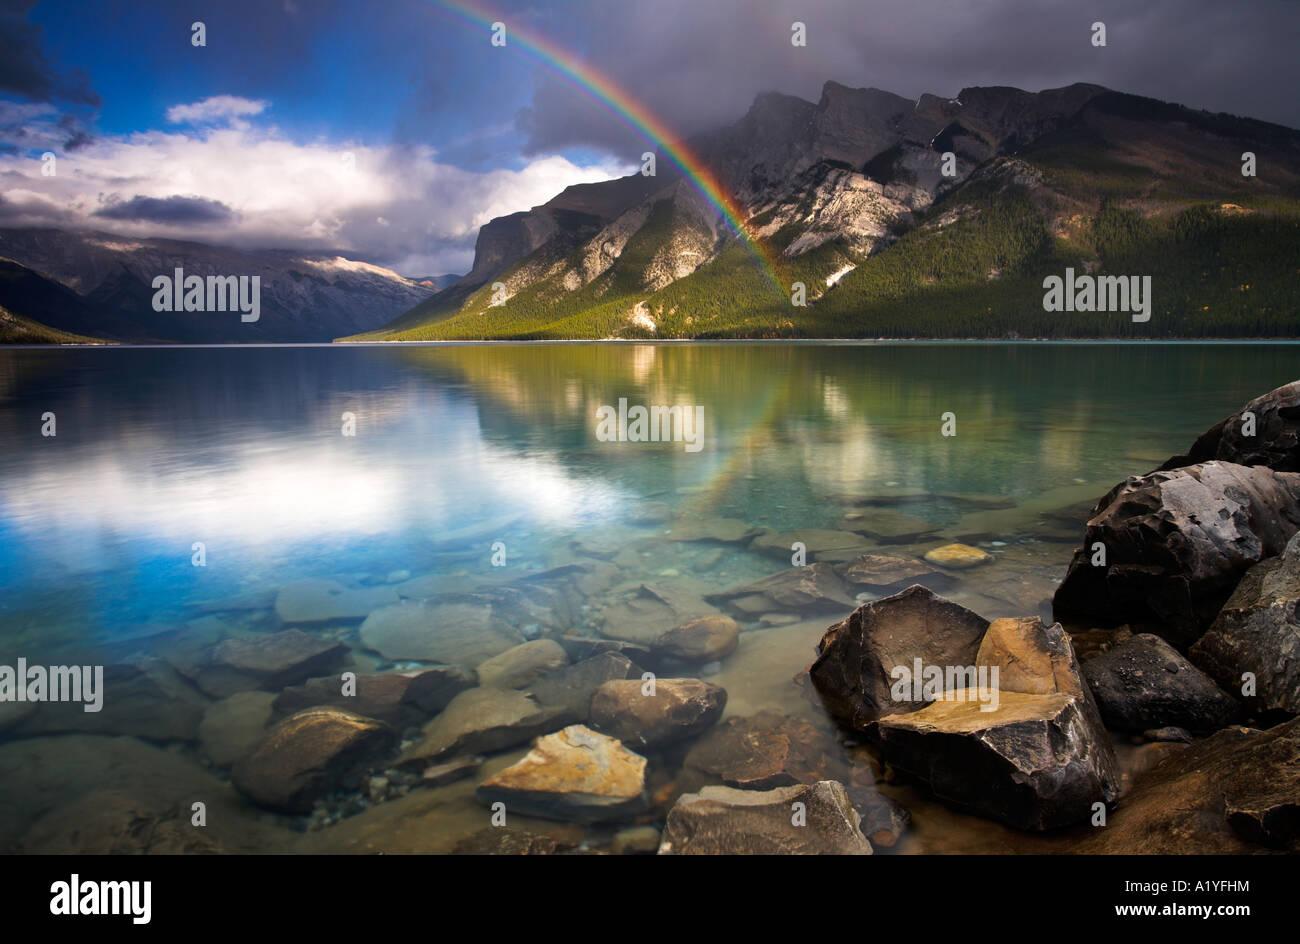 Rainbow over Lake Minnewanka, Banff National Park, Alberta, Canada - Stock Image